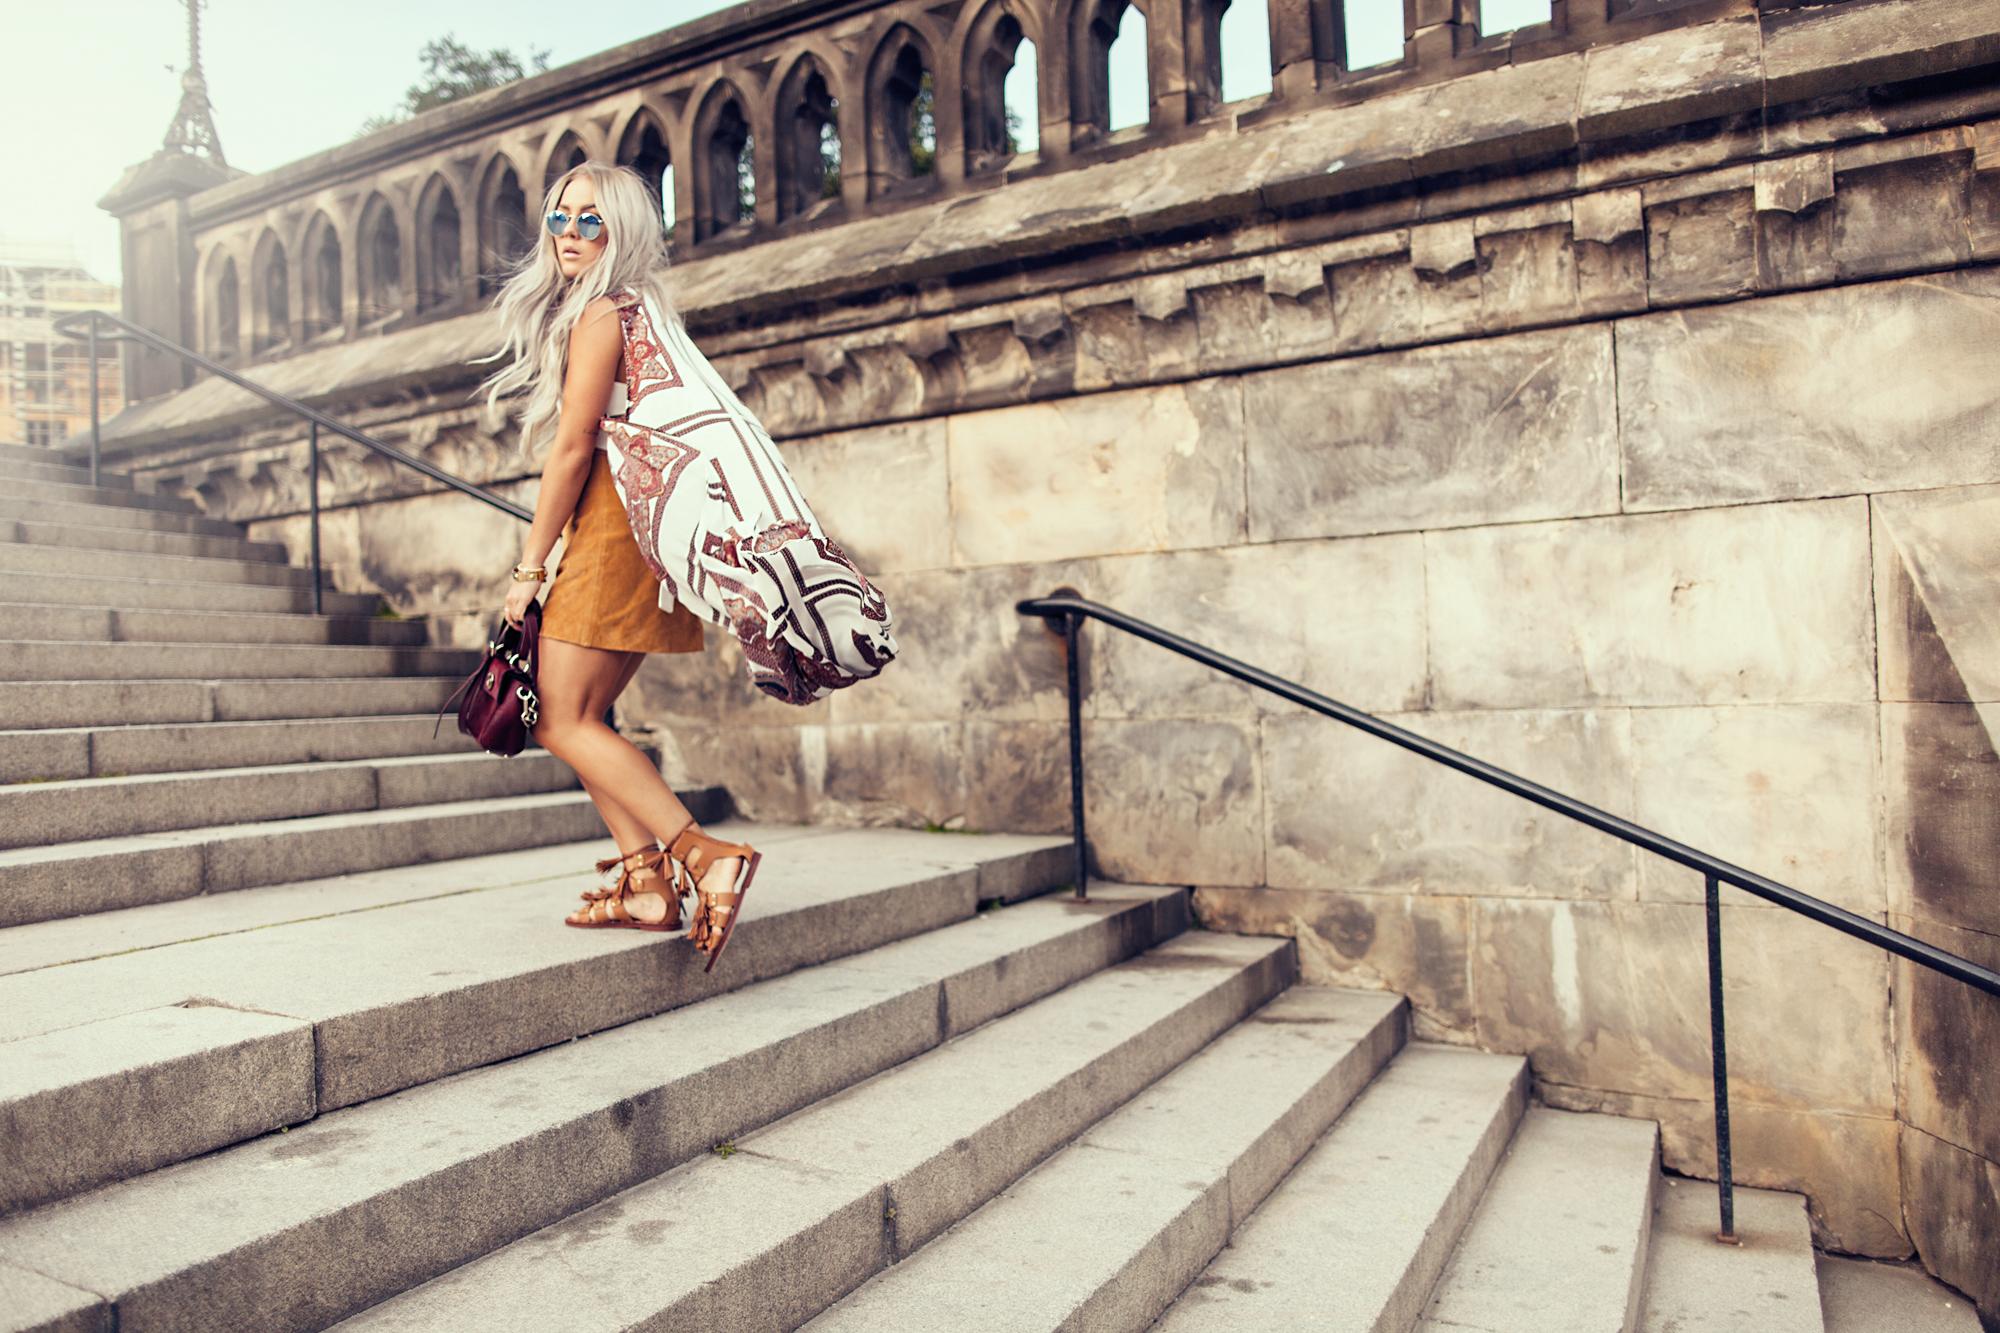 Photographer: Elin KeroContact: blogg@elinkero.seBlog: http://nevnarien.se/